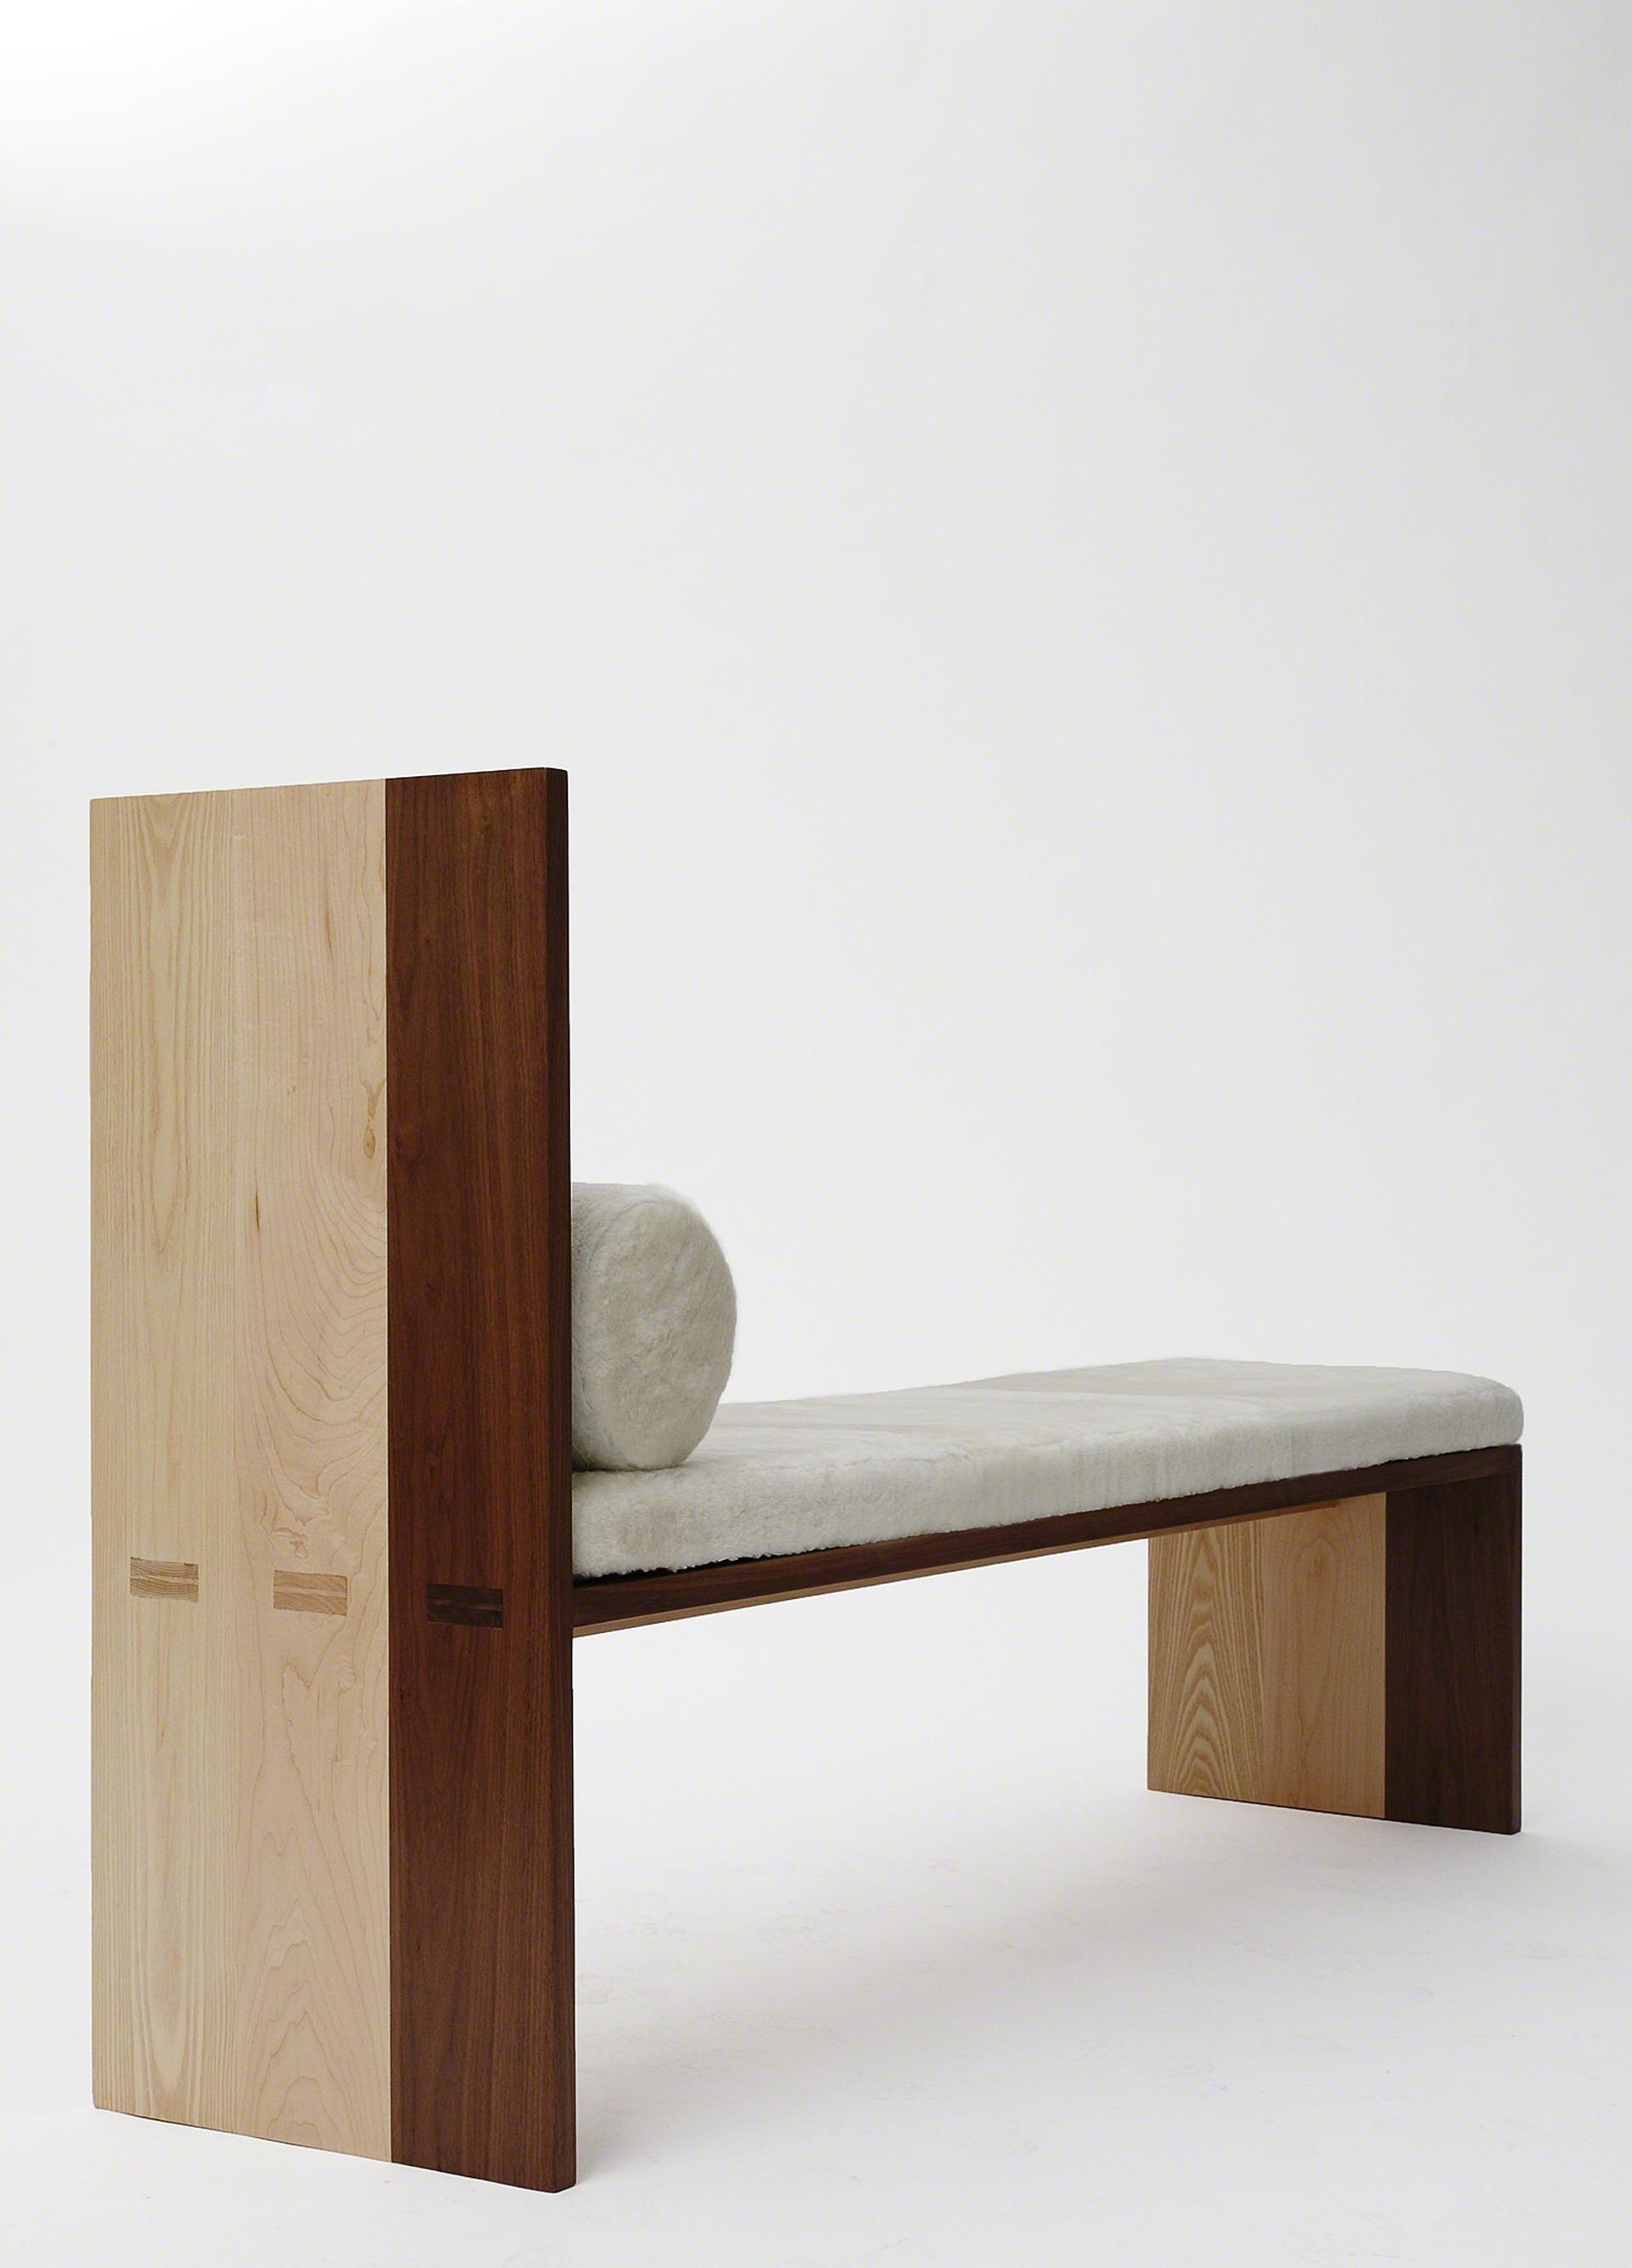 Maple Ash Walnut Bench  by Tinatin Kilaberidze